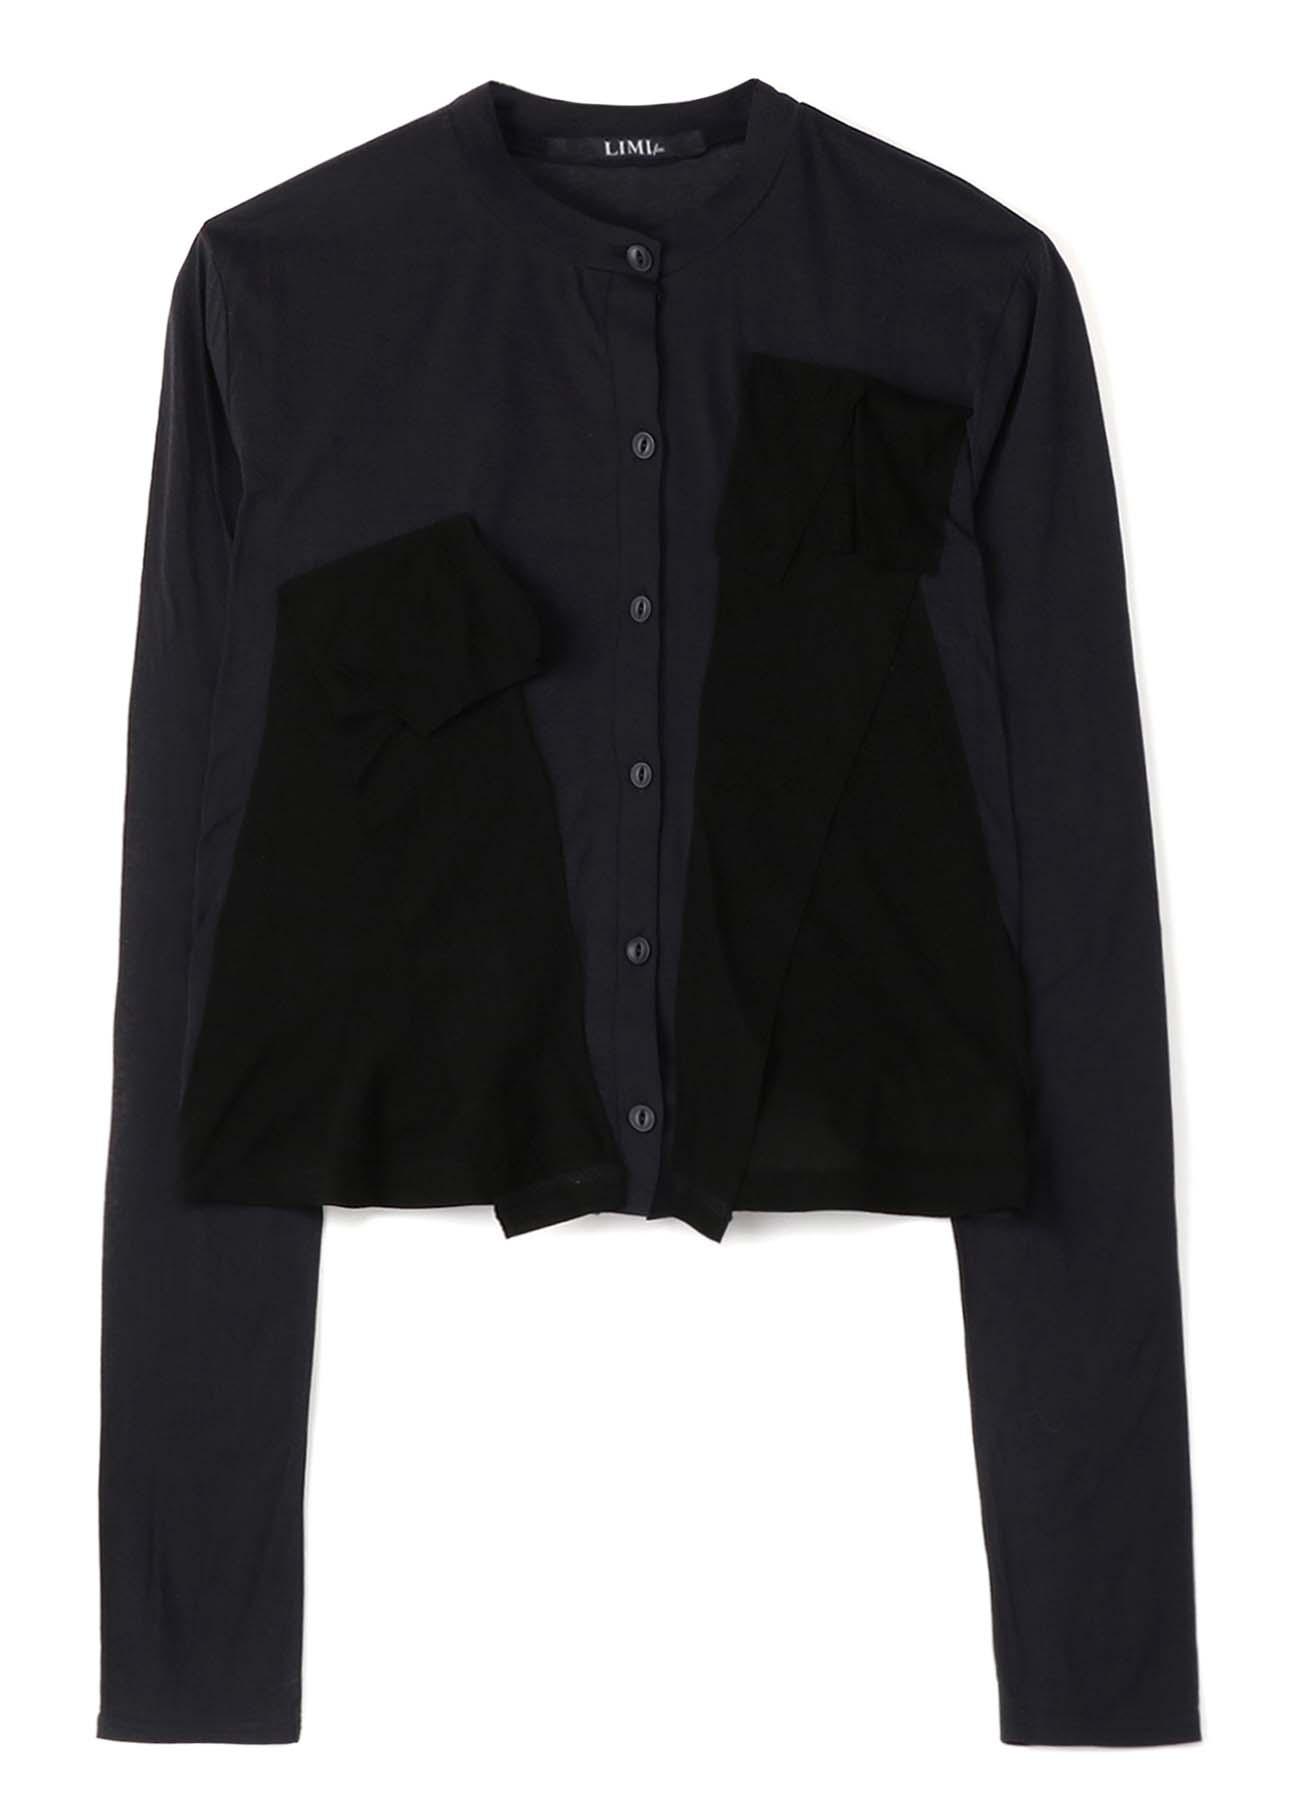 Cotton Crepe Plain Stitch Mix Layered Design Cardigan